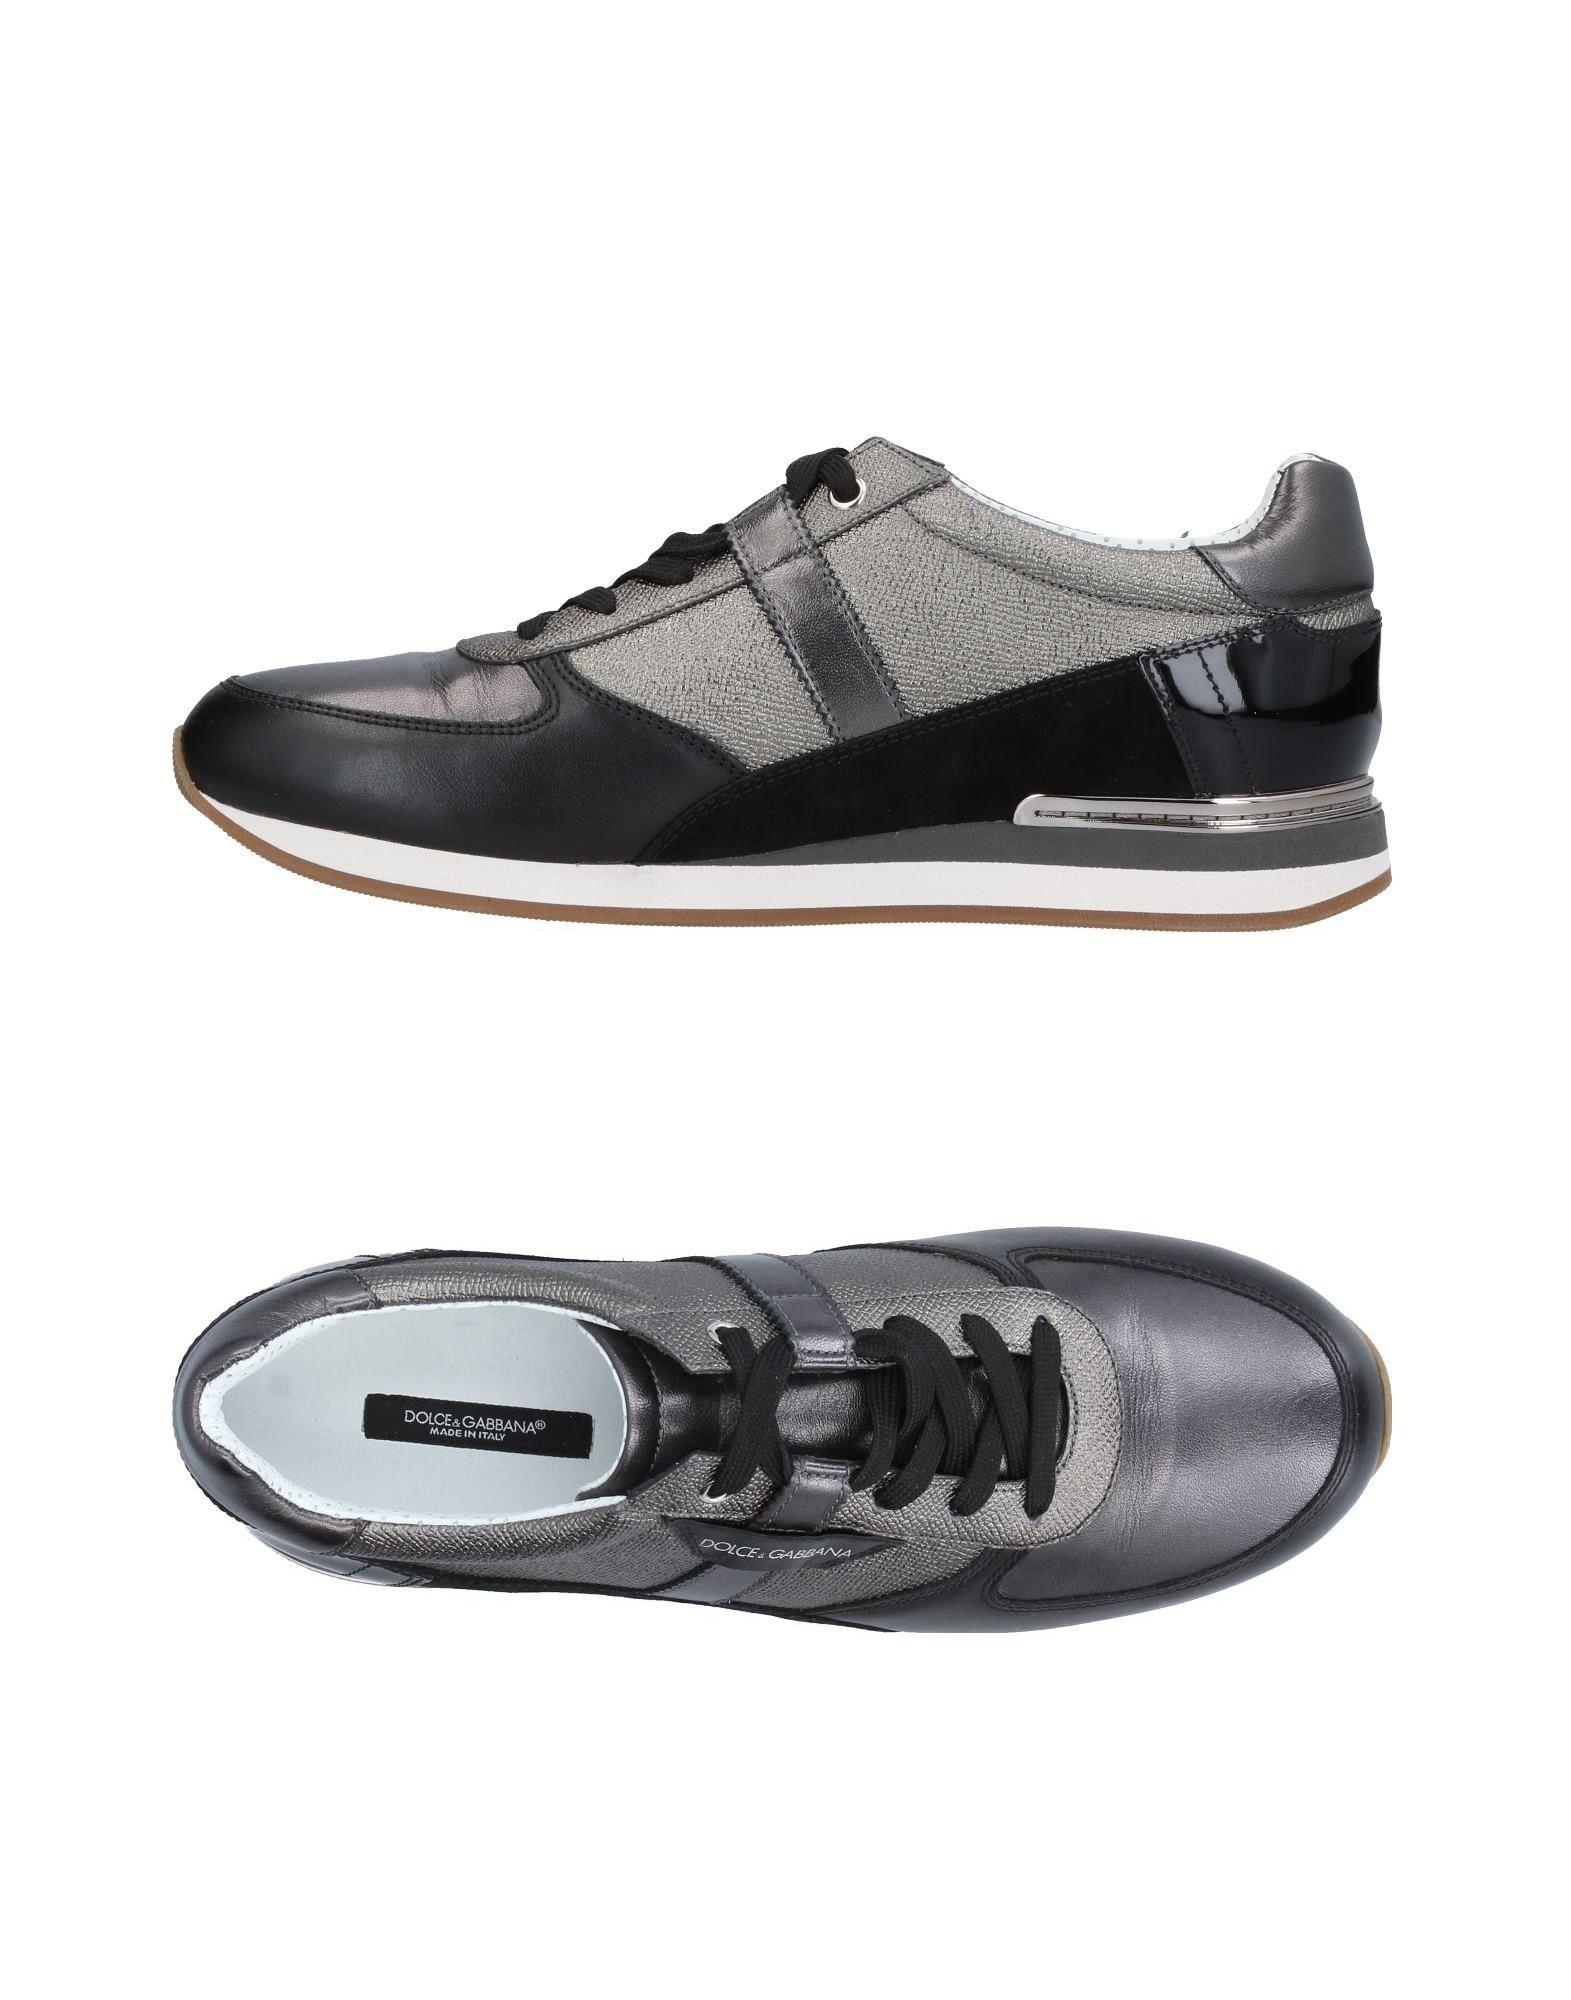 Dolce & Gabbana Sneakers Herren  11366273TG Gute Qualität beliebte Schuhe